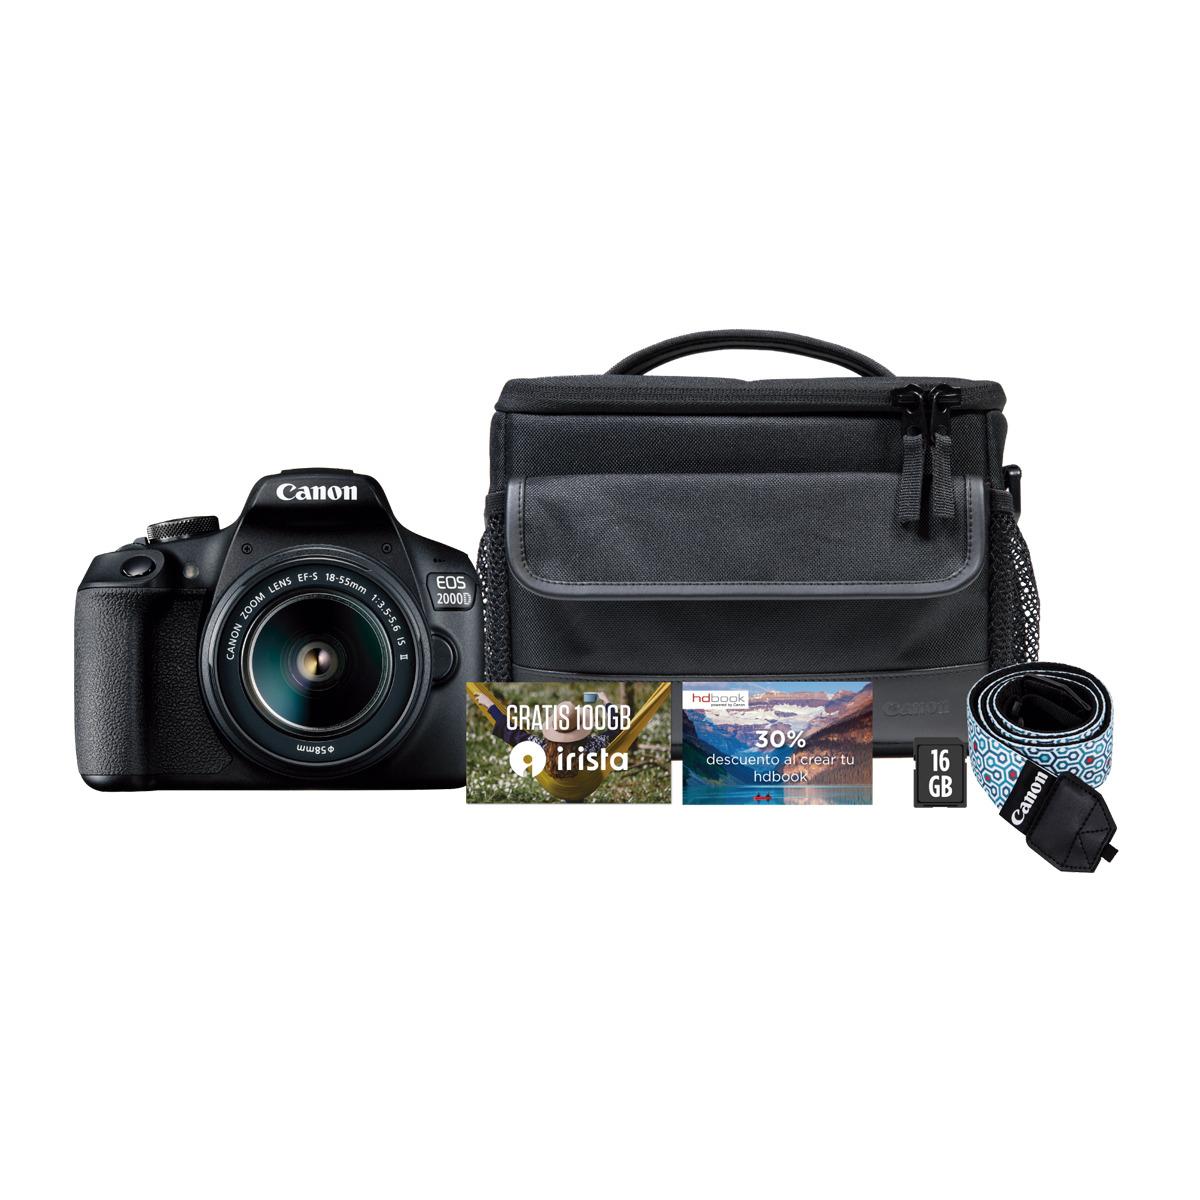 Cámara réflex Canon EOS 2000D con Objetivo EF-S 18-55 mm IS II